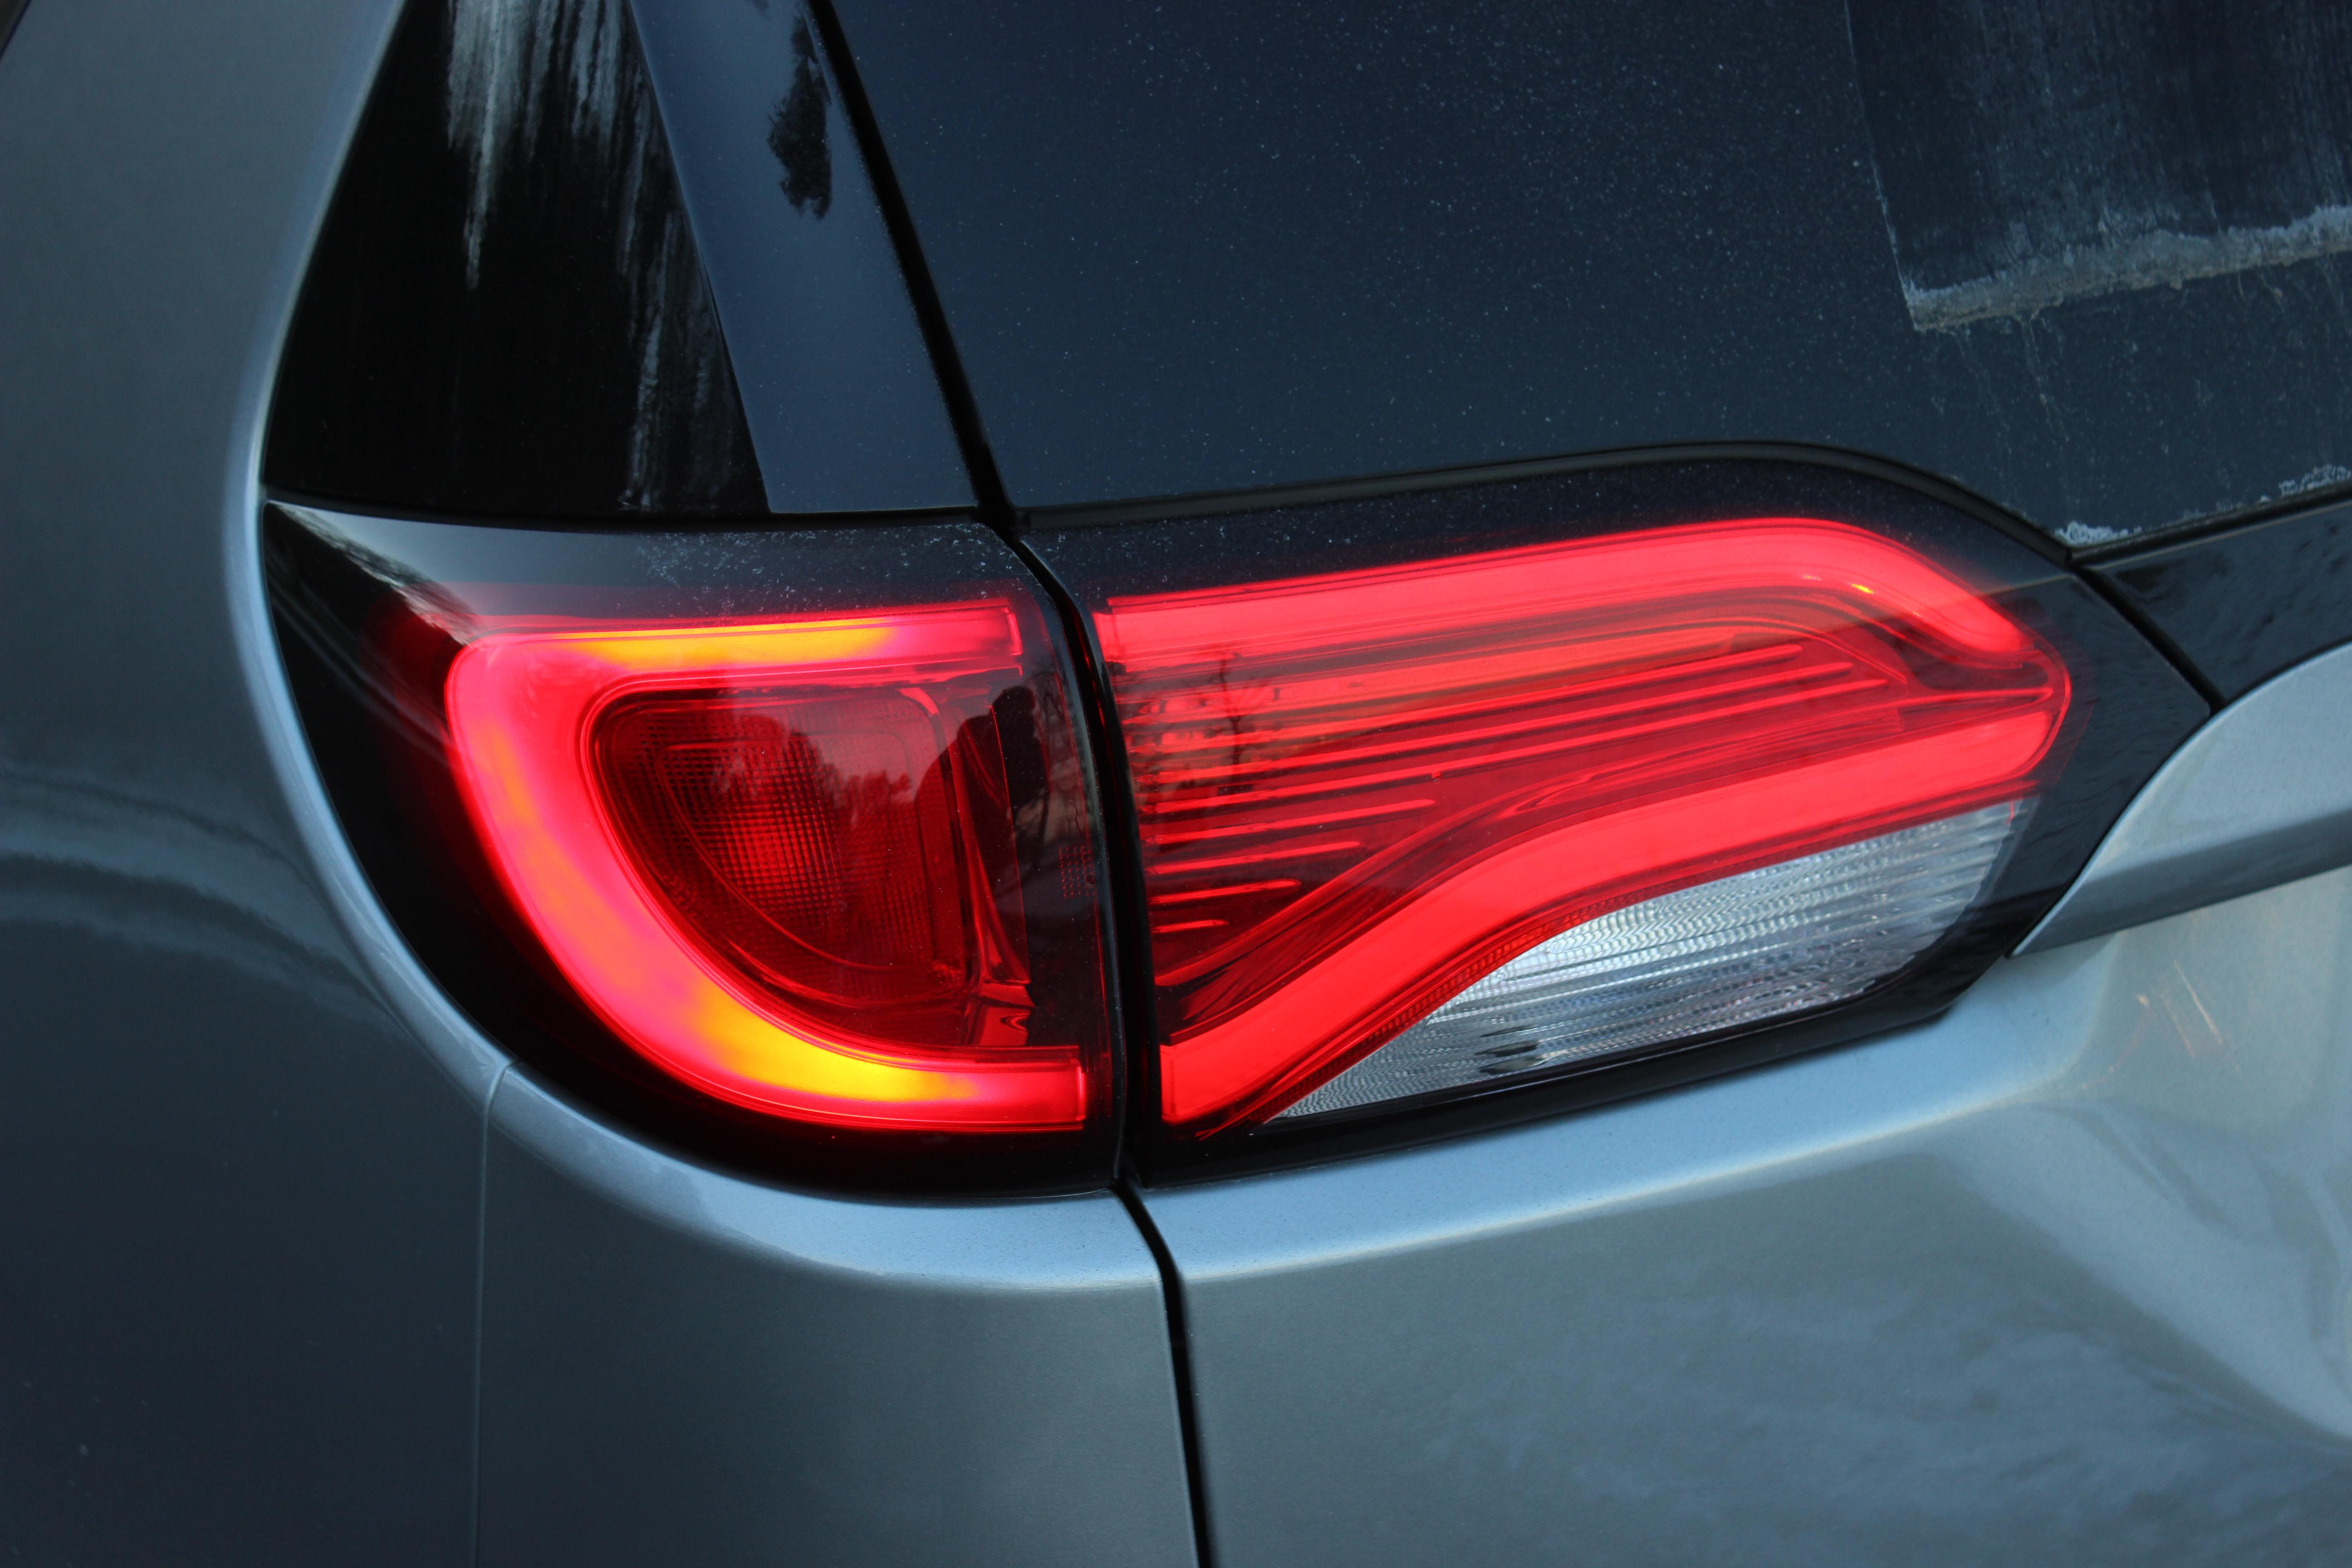 Chrysler Pacifica power